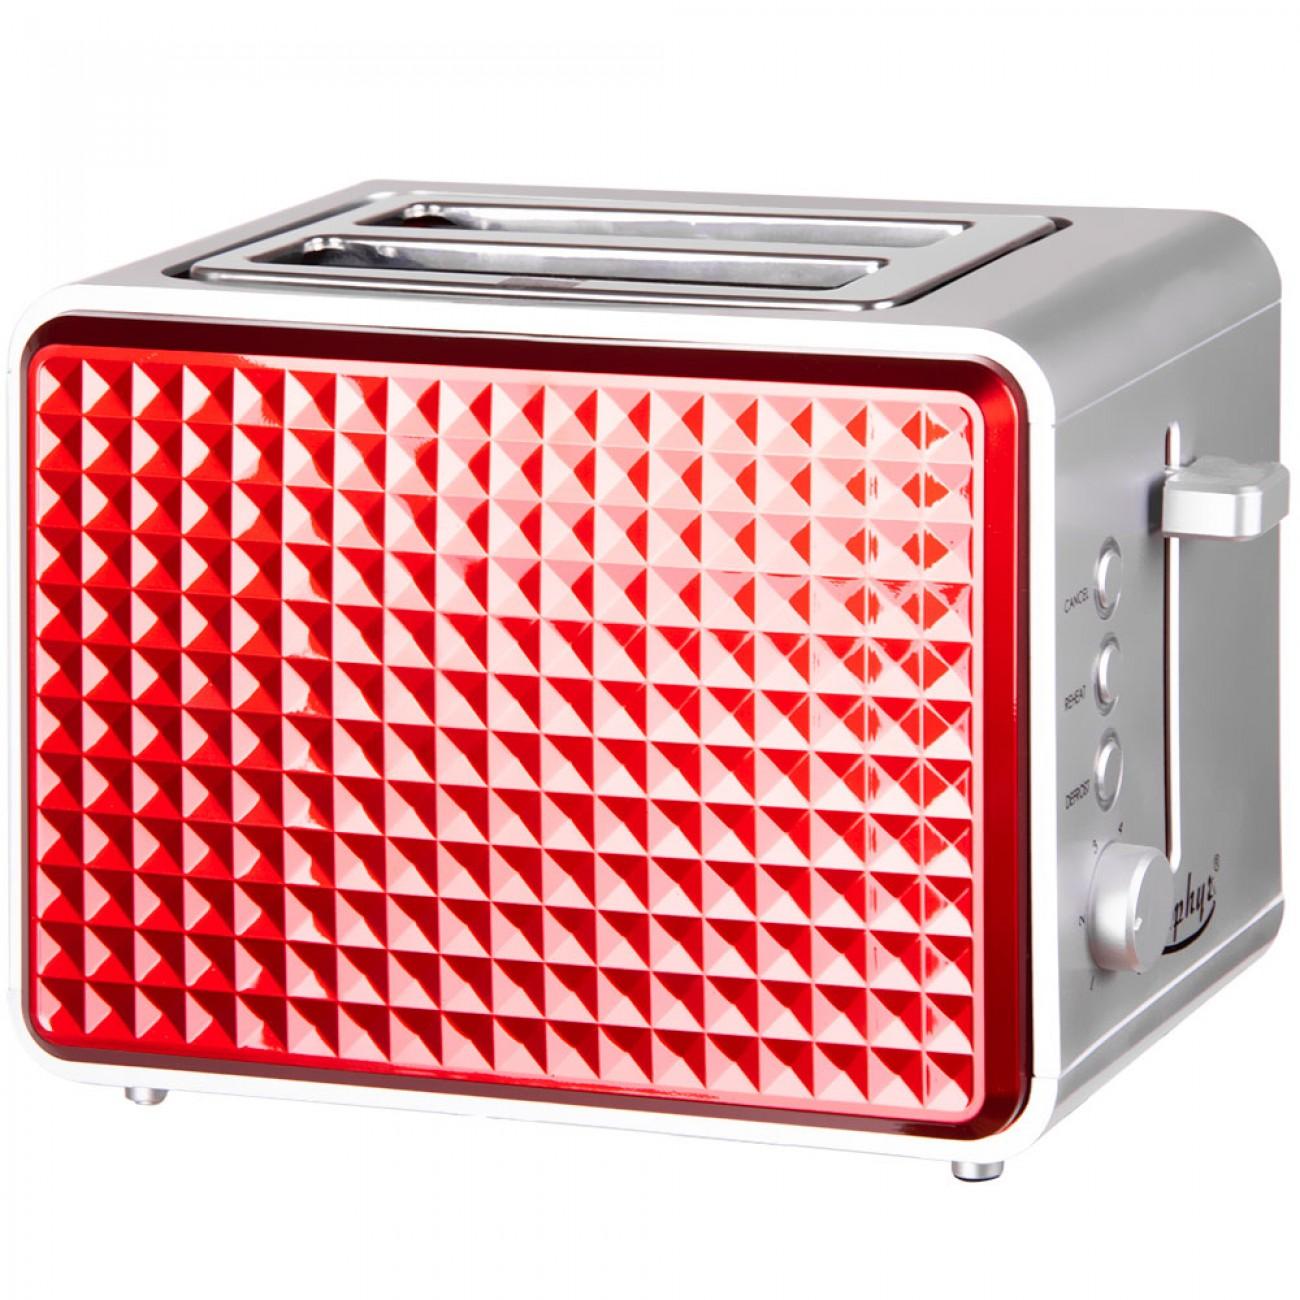 Тостер за хляб ZEPHYR ZP 1440 V, 750W, 2 филийки, Червен в Тостери за хляб - ZEPHYR | Alleop